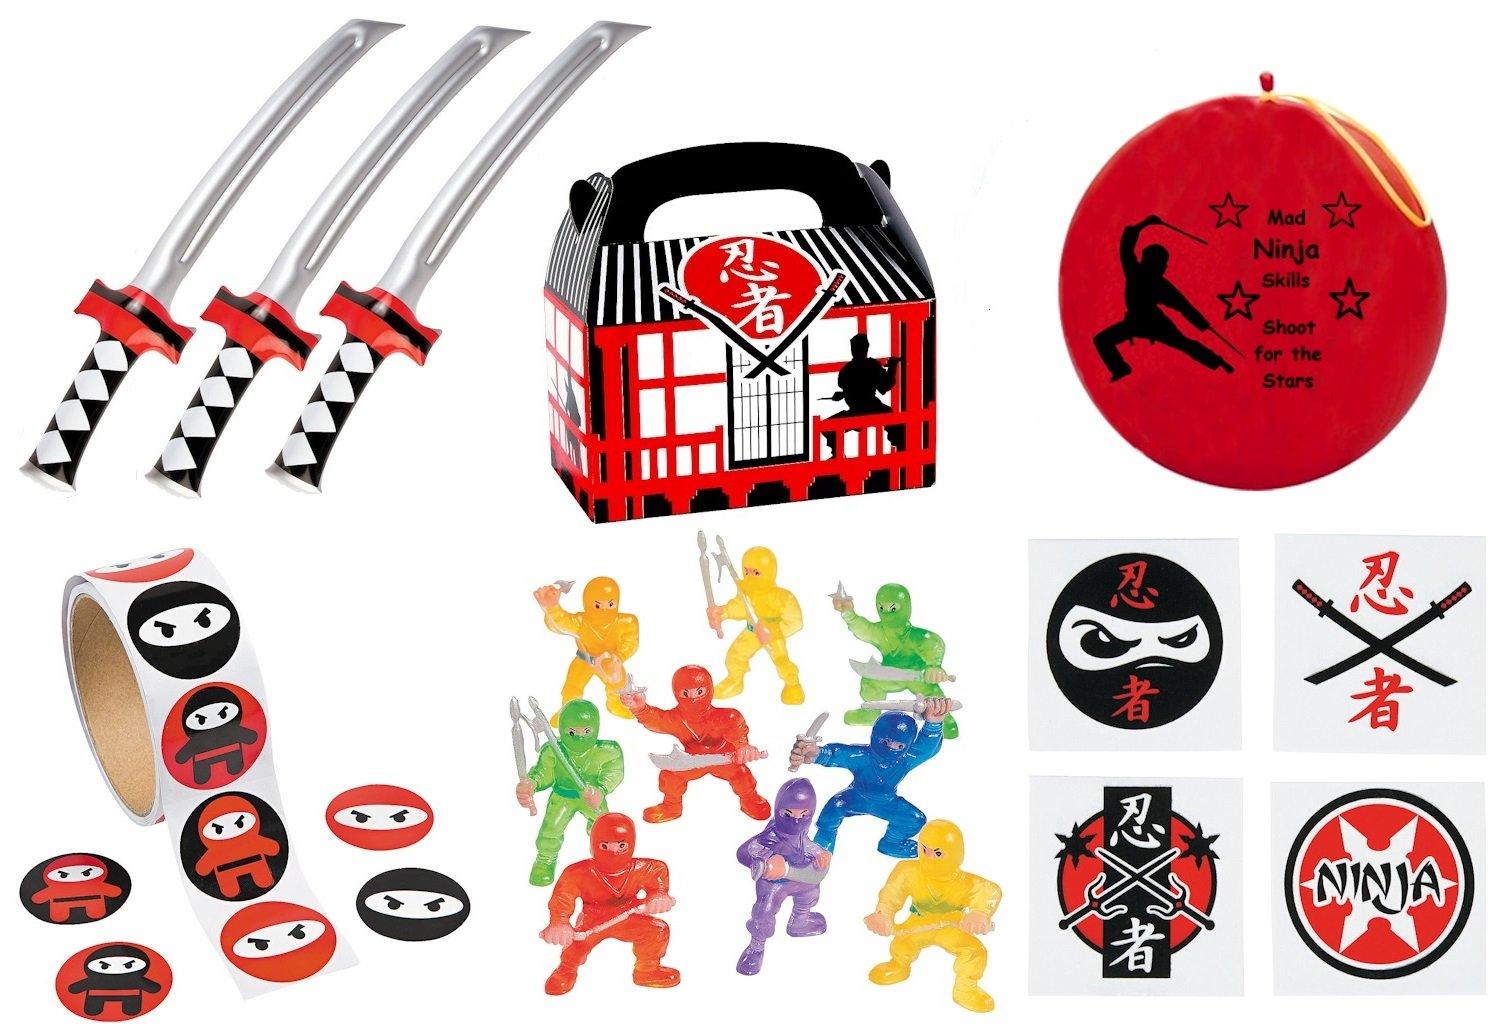 Ninja Wall Climbers Slap Bracelets Chop Sticks Stickers 48 PC Ninja Party Pack Ninja Party Favors